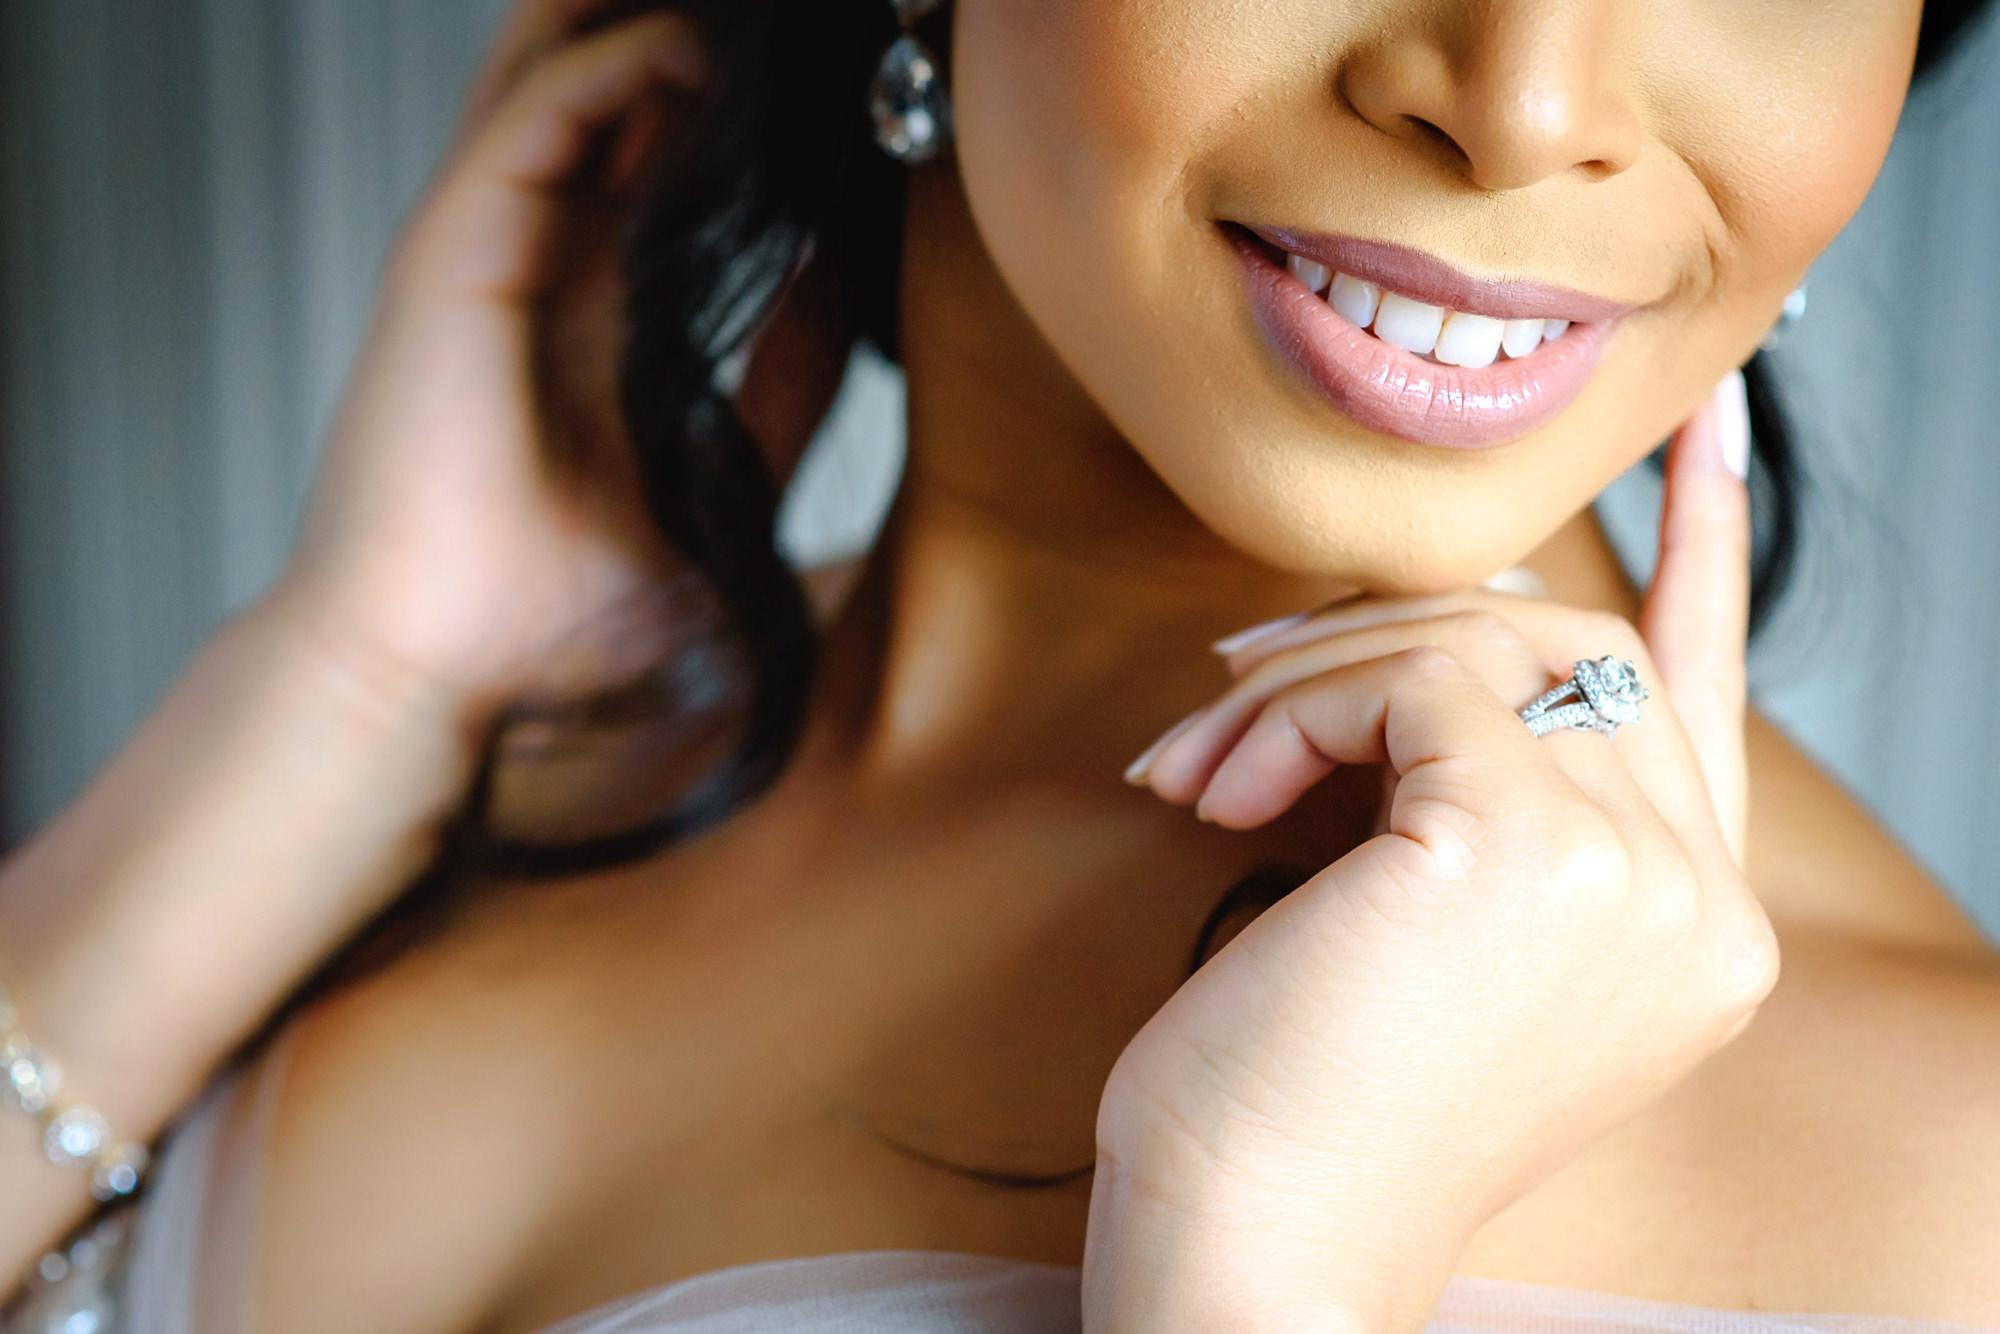 Bride with soft blush lipstick and square diamond ring - photo by Jide Alakija - New York